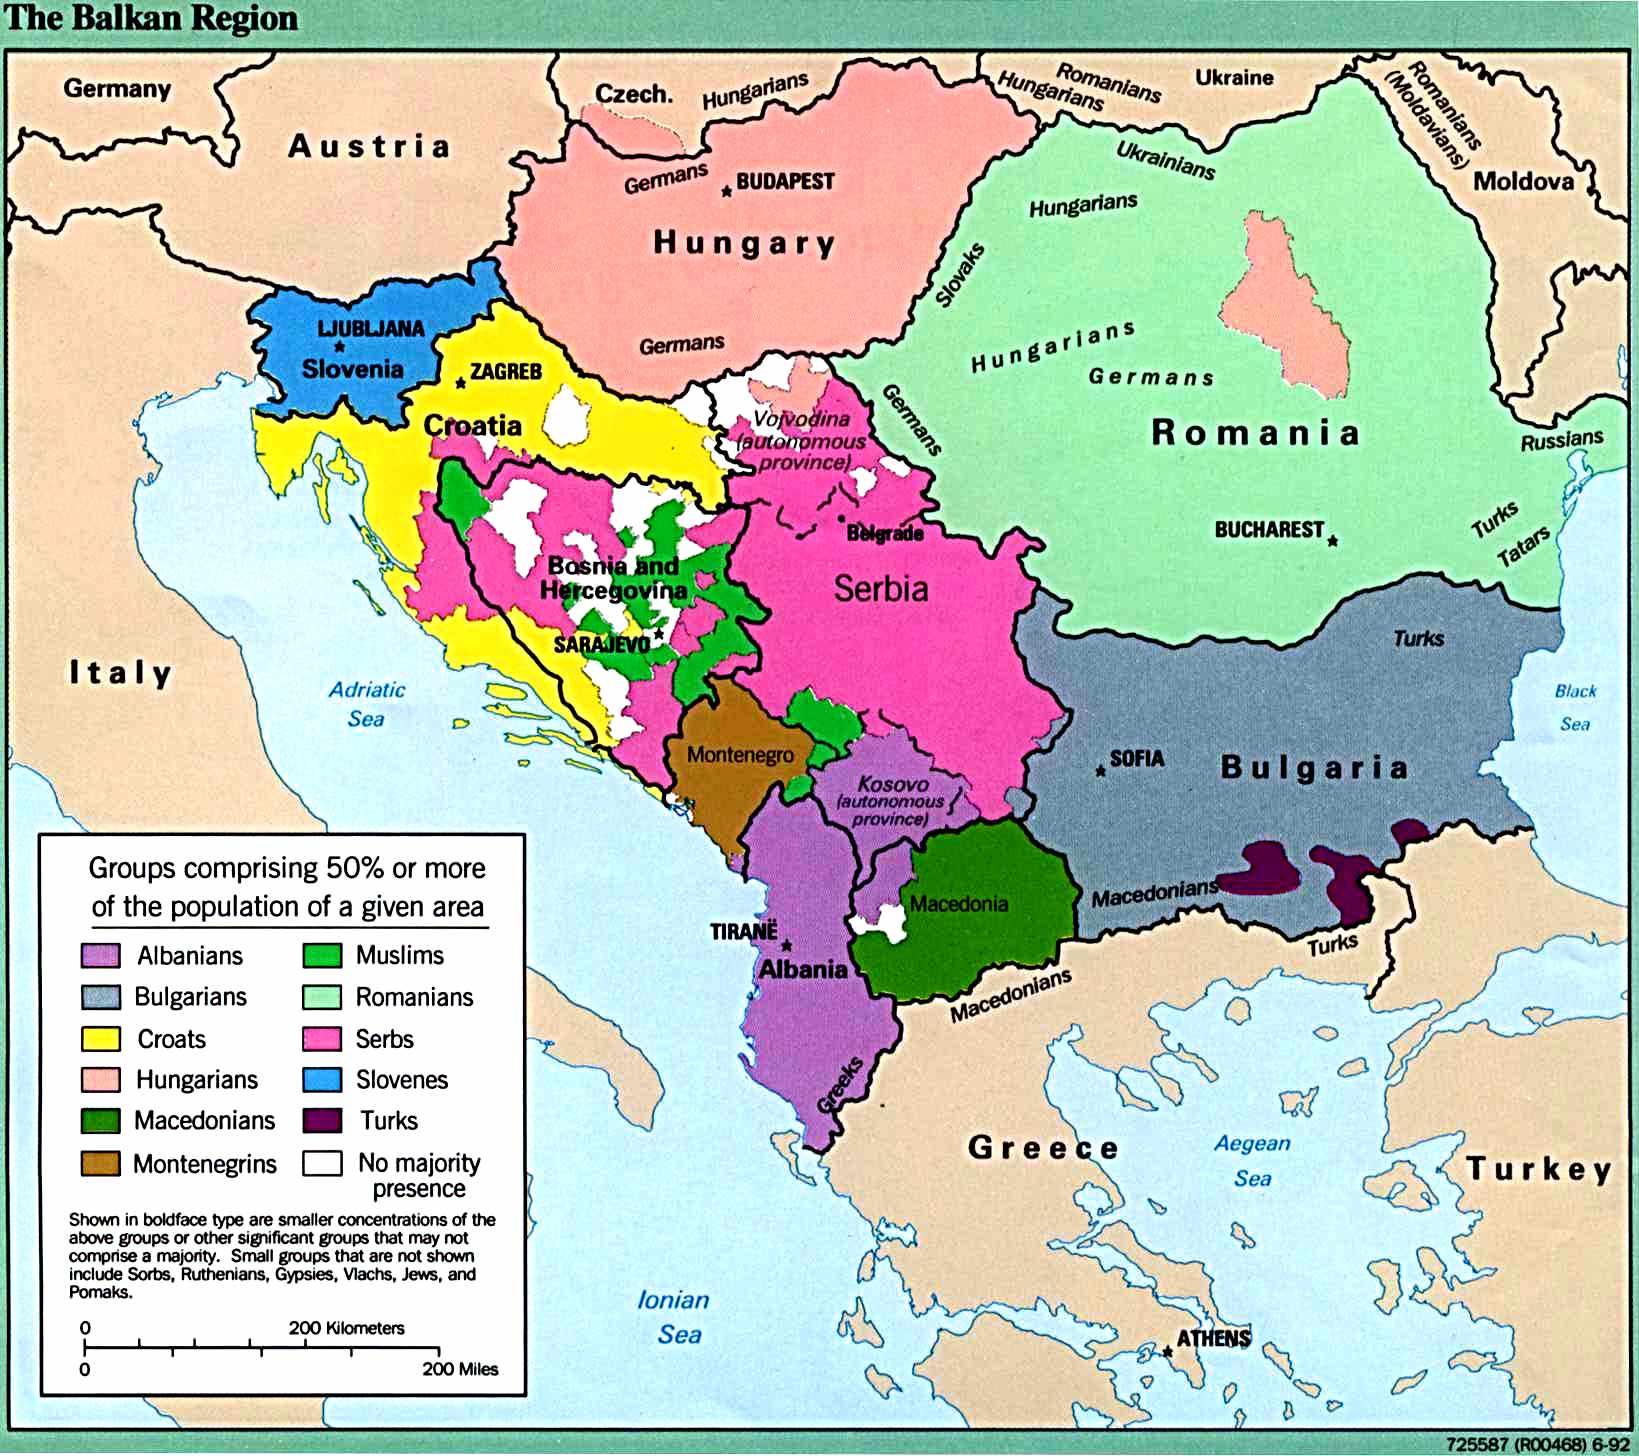 https://i0.wp.com/www.makedonija.info/CIA_Balkans.jpg